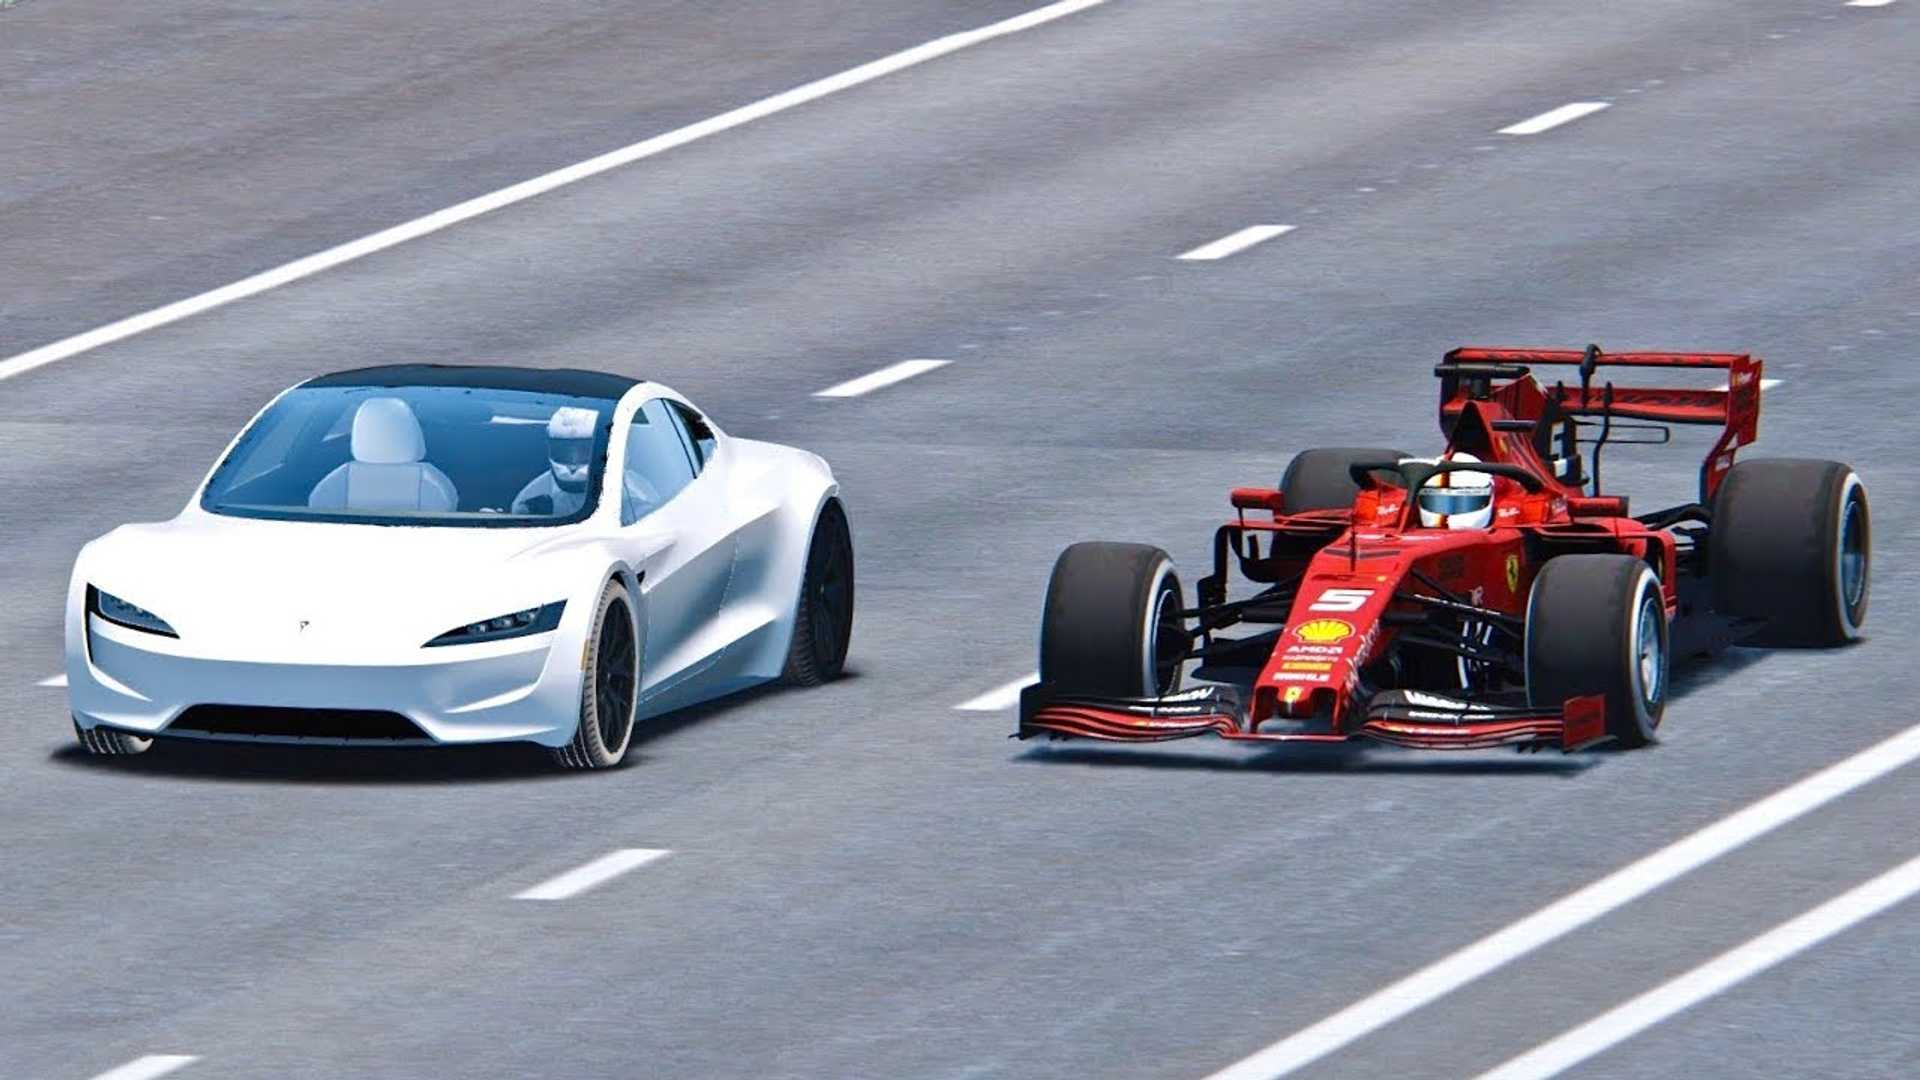 Watch Tesla Roadster Race Ferrari Formula 1 Car: Simulated Video